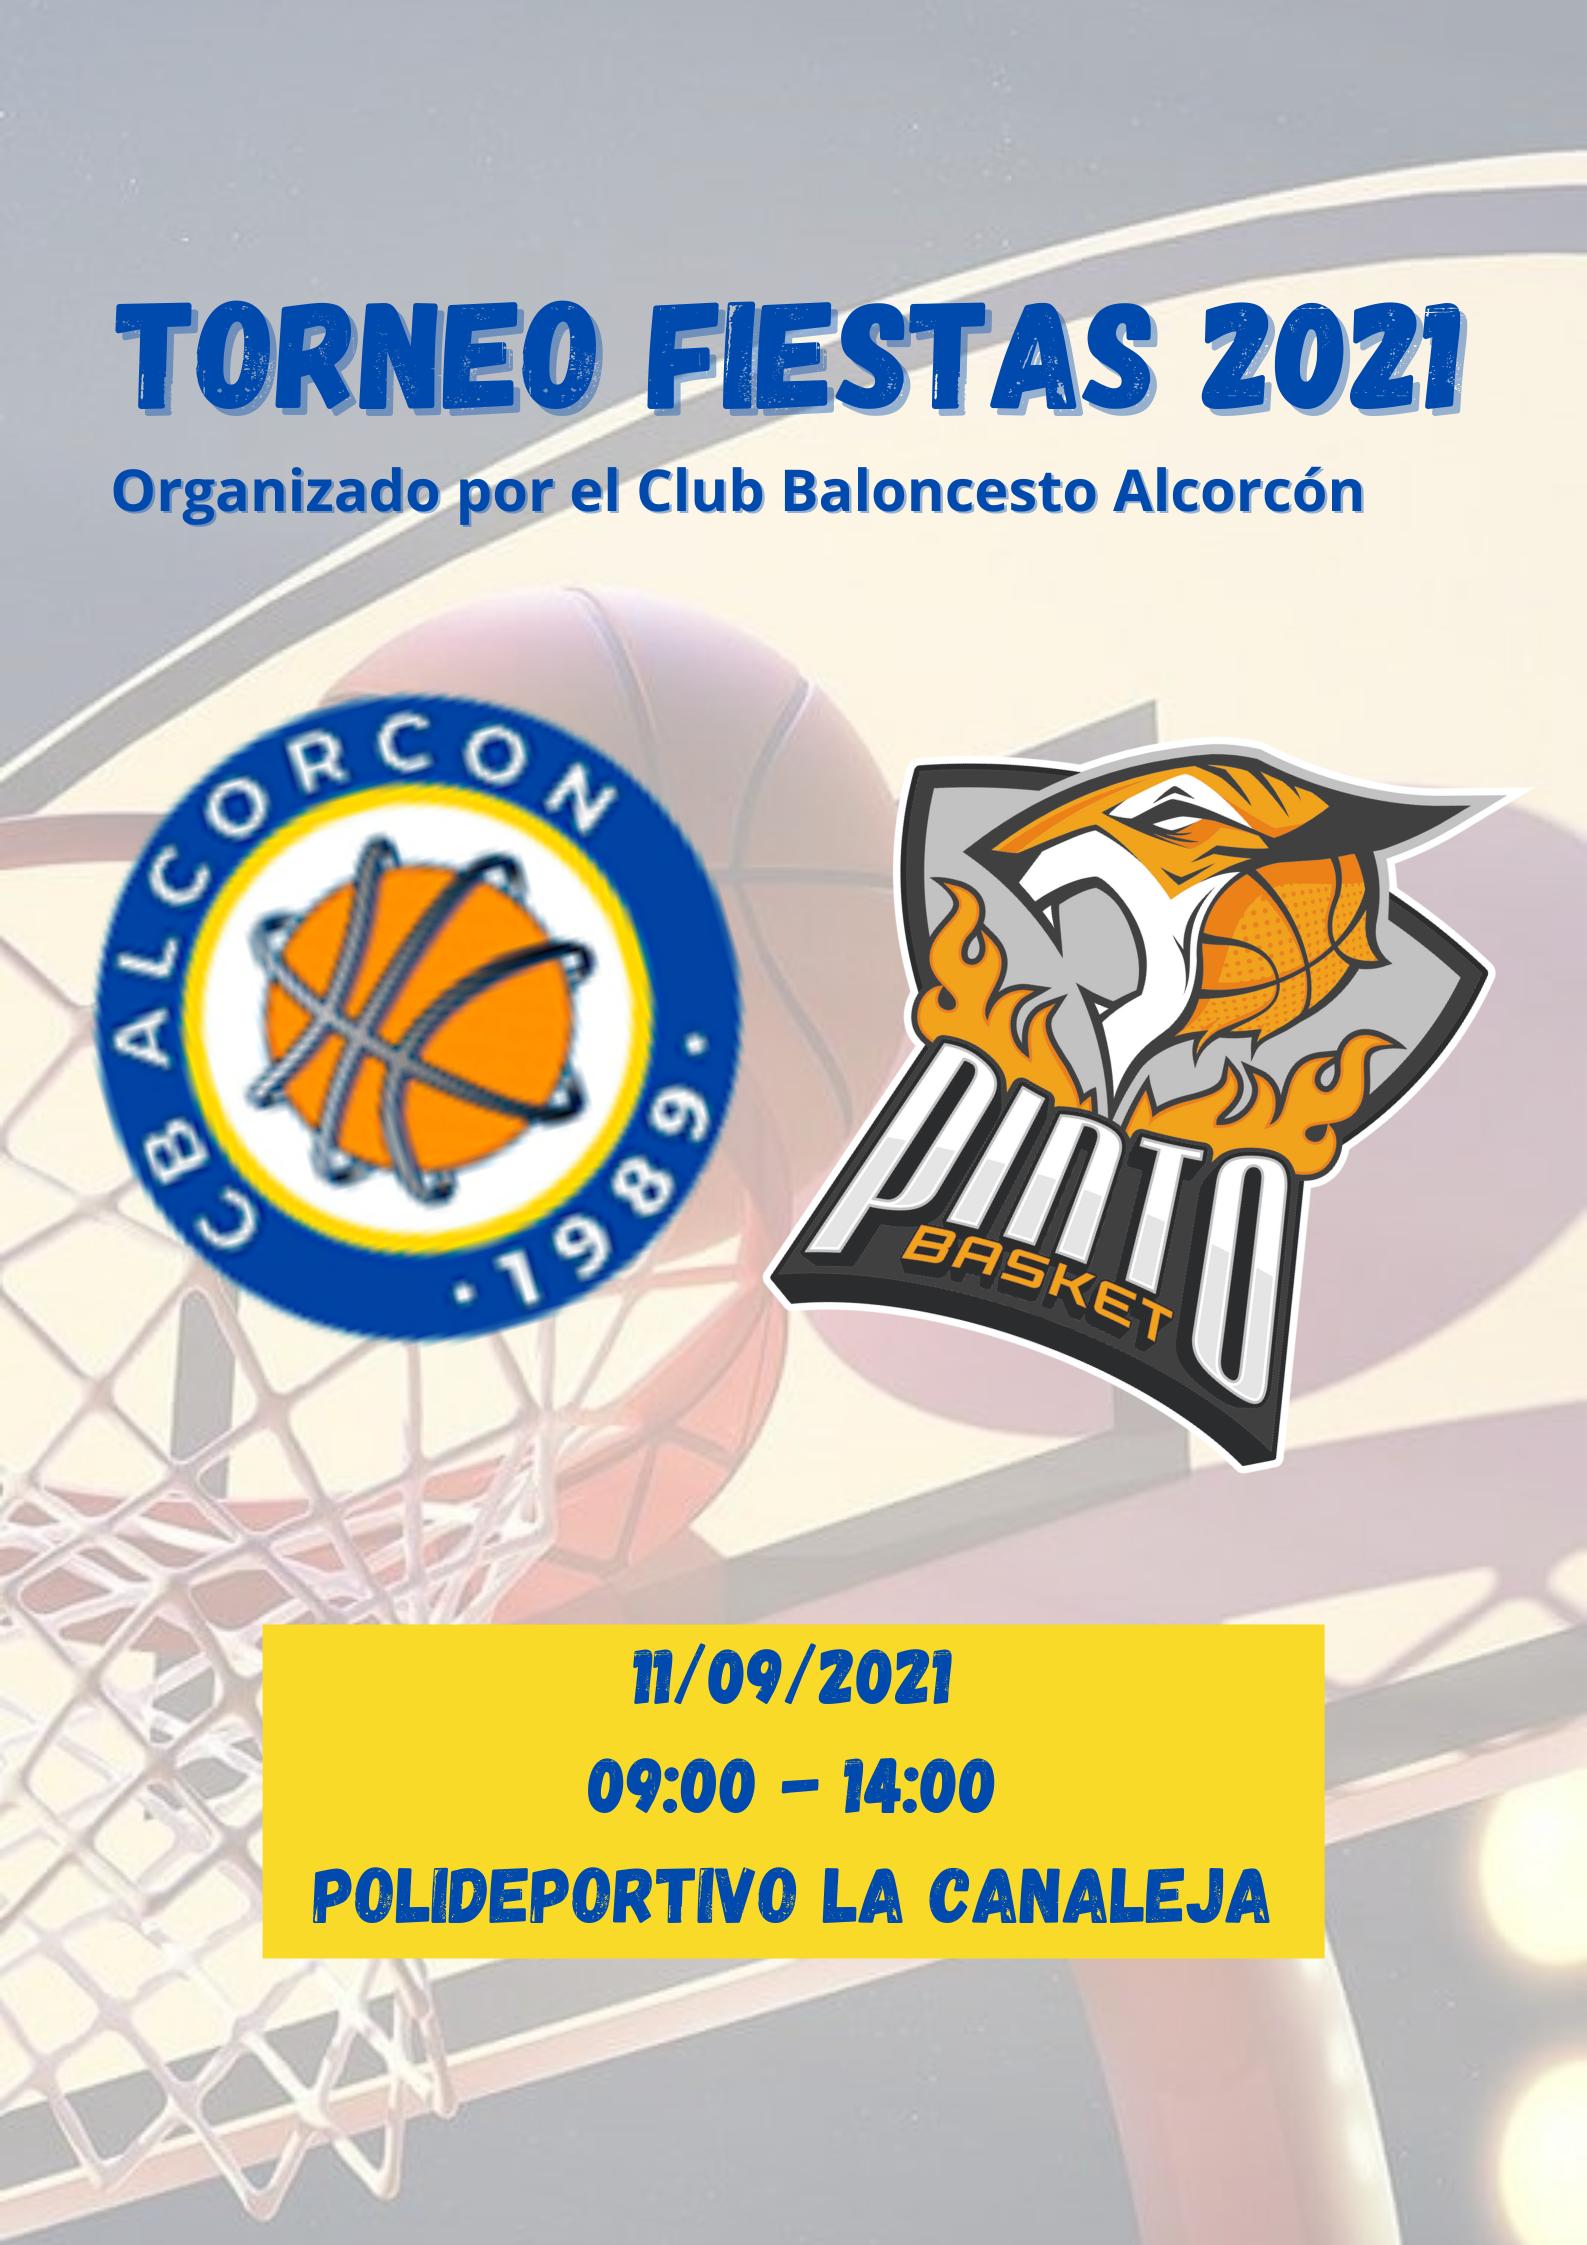 11092021 0900 - 1400 Polideportivo La Canaleja